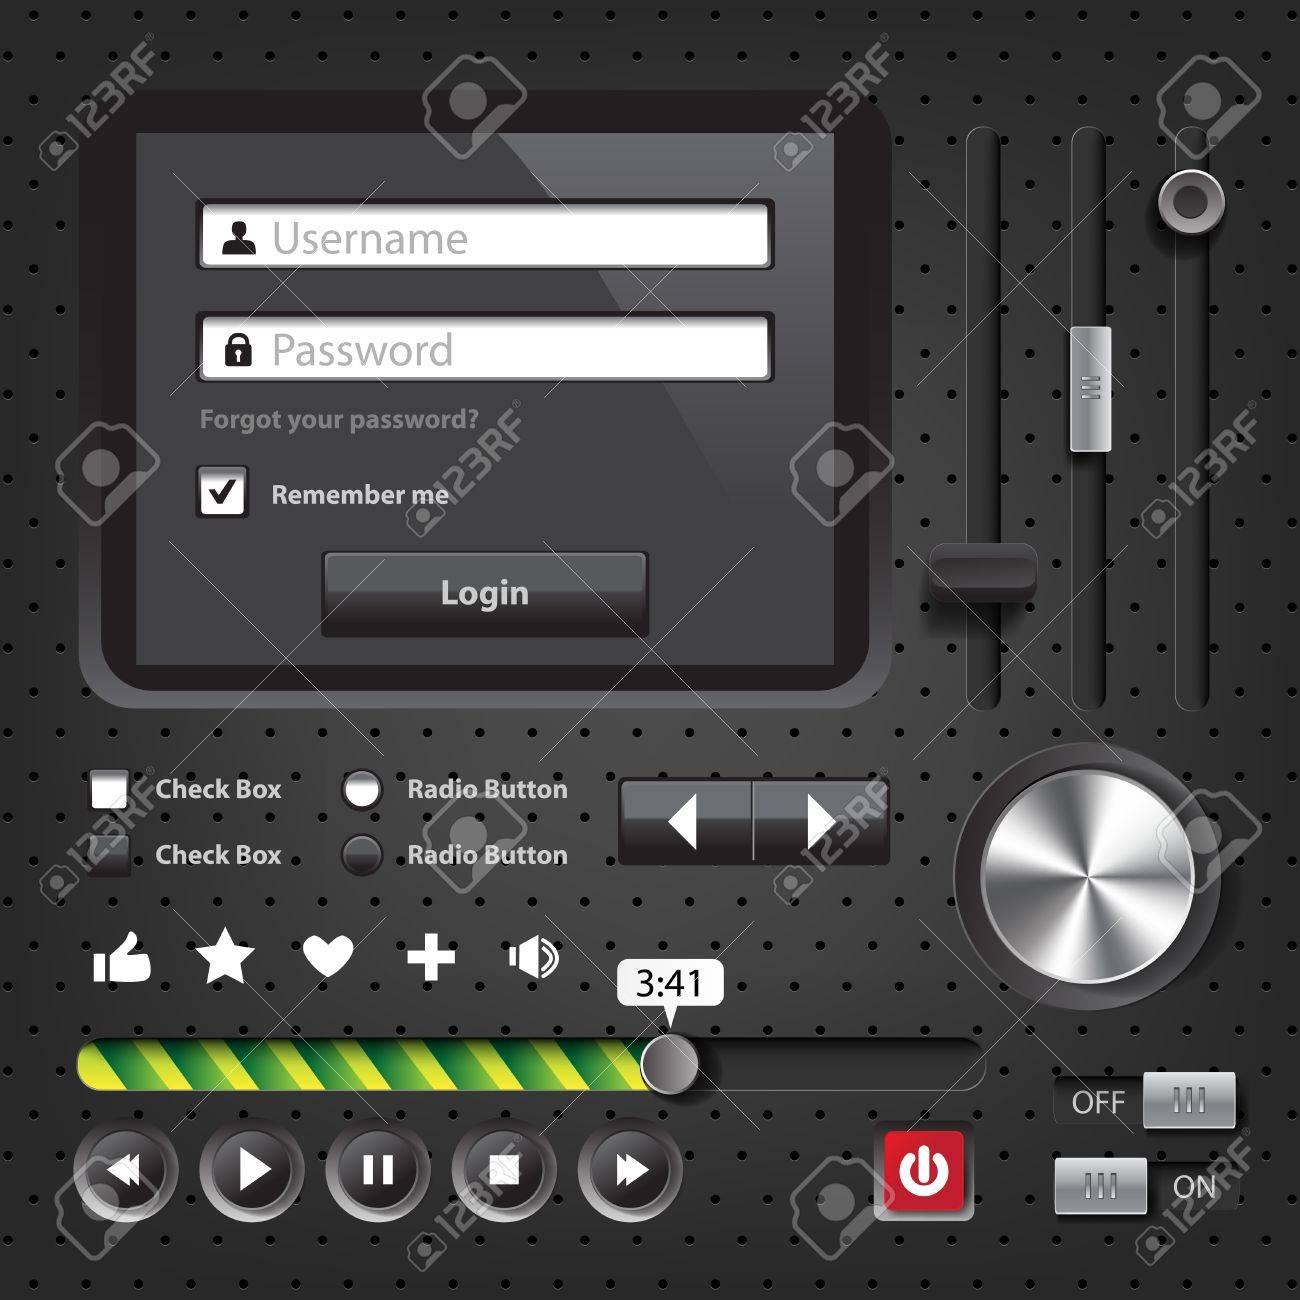 Design elements Dark User Interface Controls with login window Stock Vector - 20653415